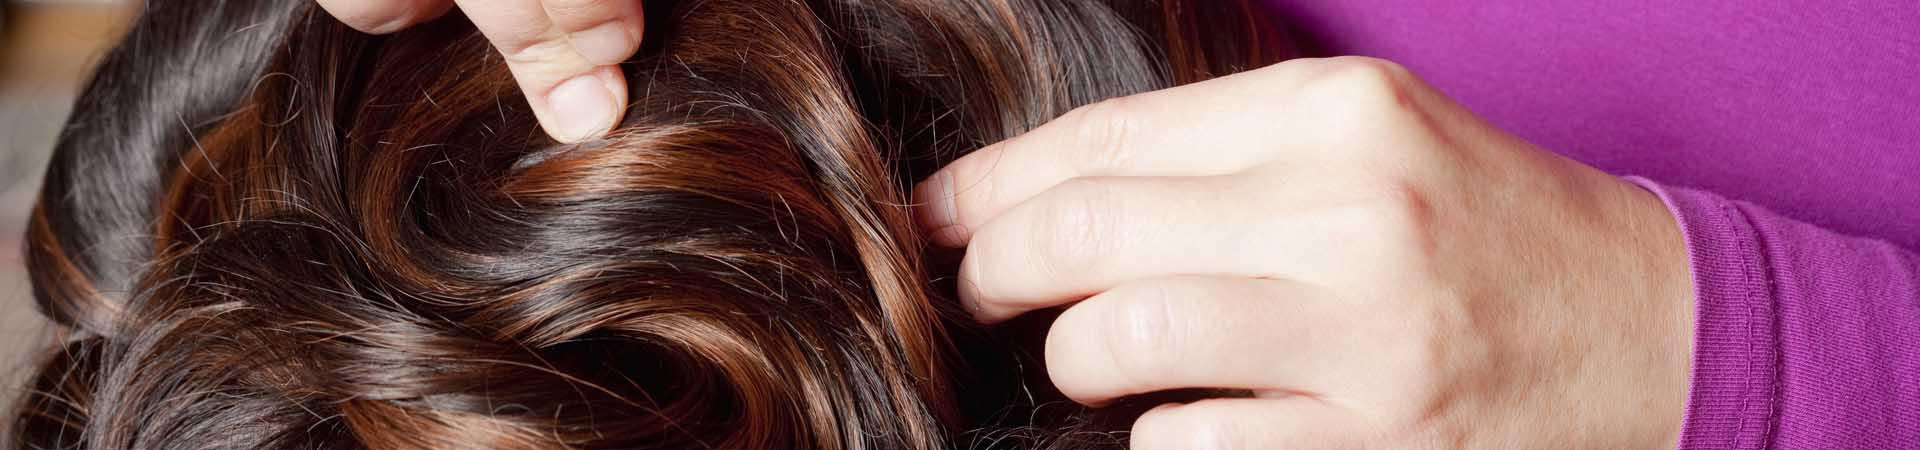 HOS Medical Wigs – Maintenance